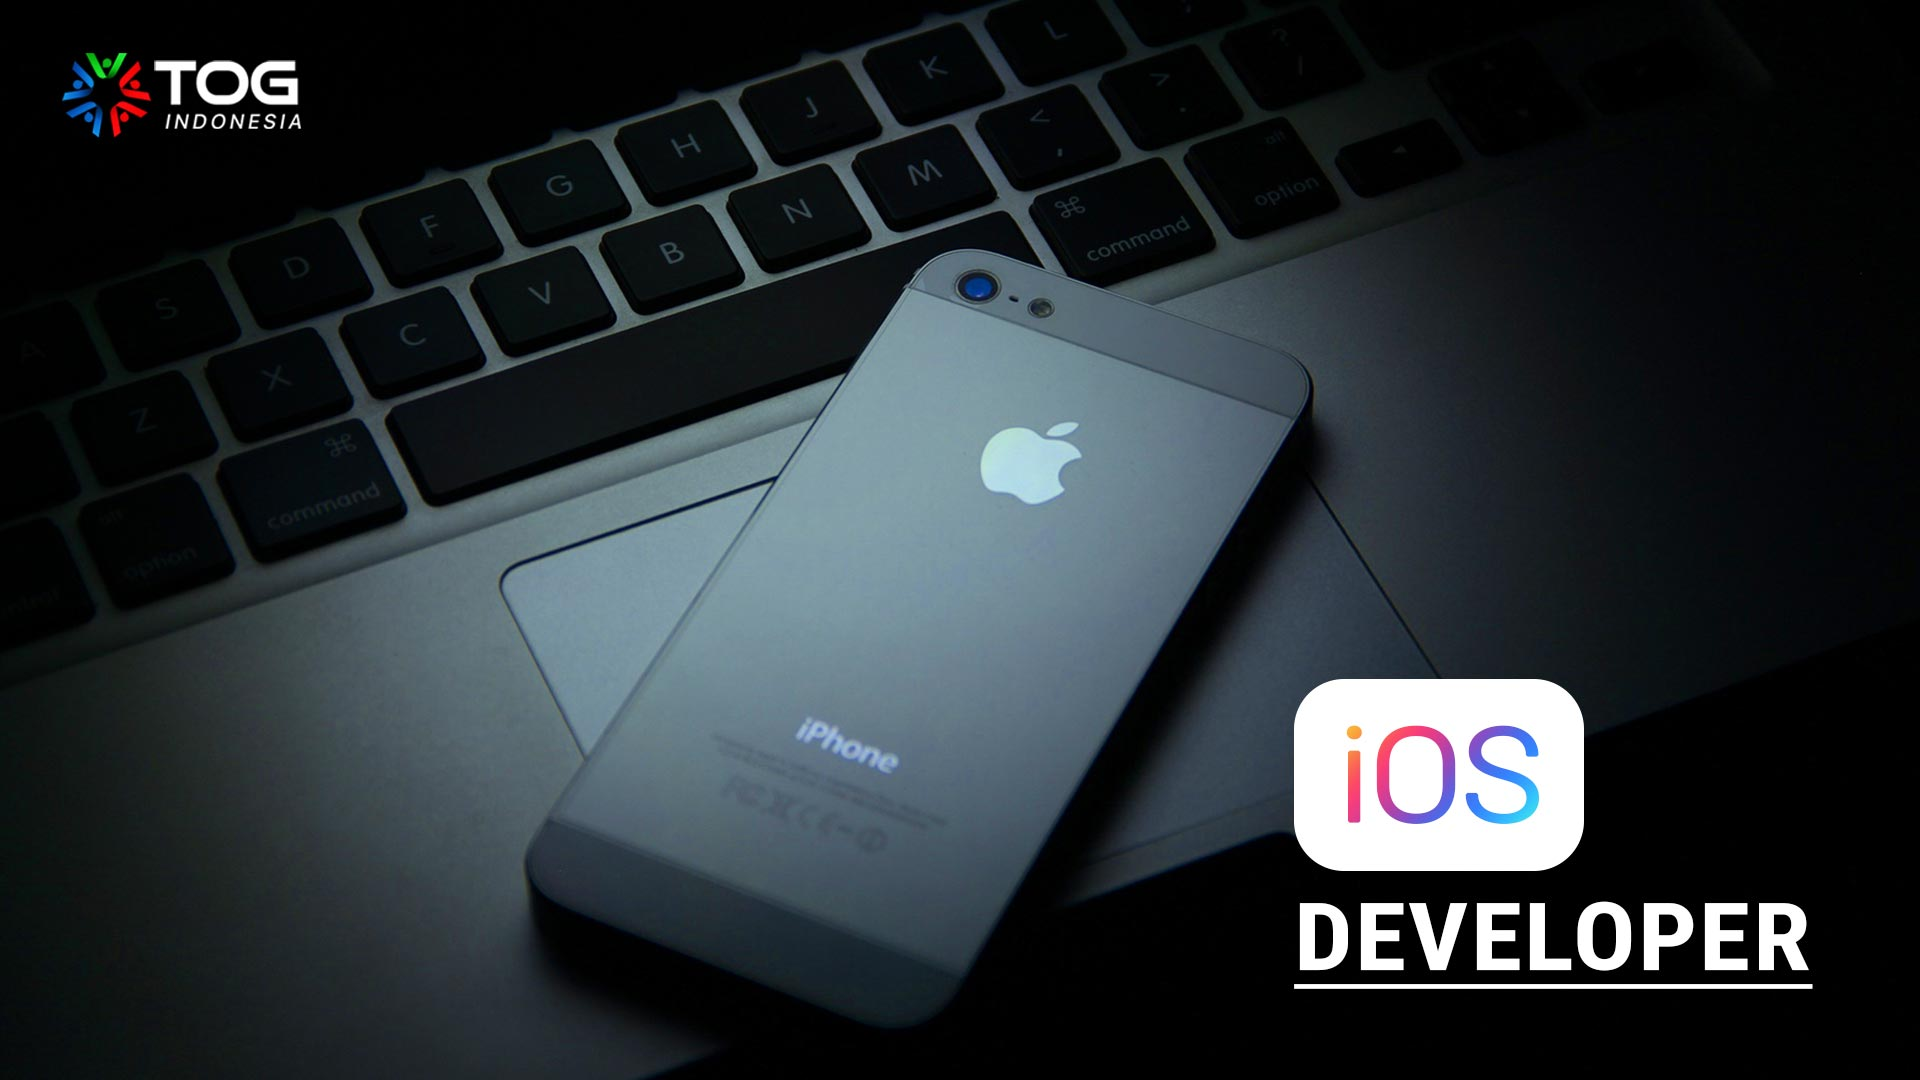 Tugas IOS Developer yang Datangkan Gaji Tinggi